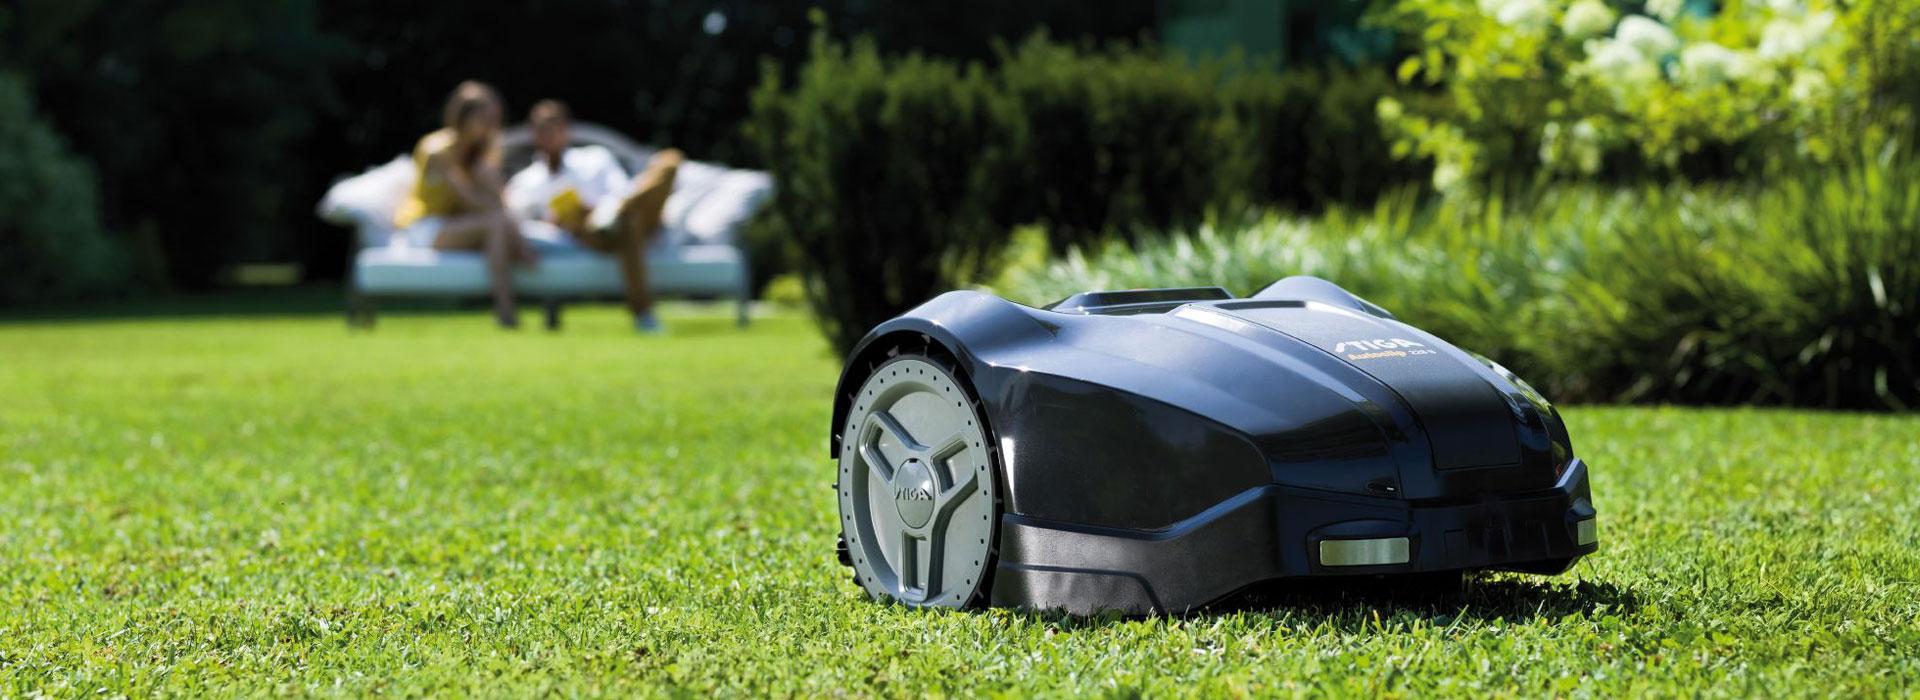 Stiga Autoclip Roboter